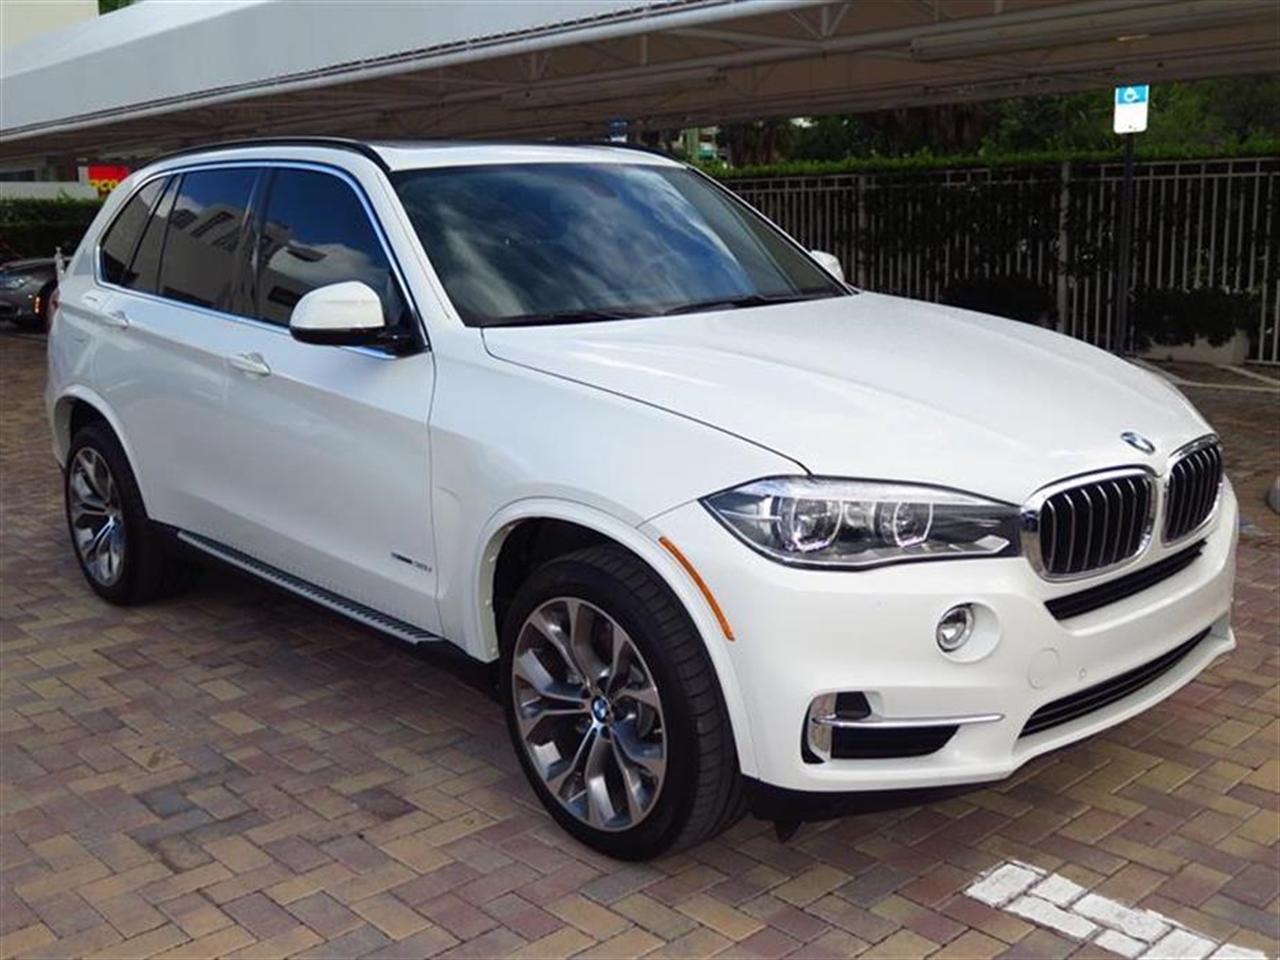 2014 BMW X5 RWD 4dr sDrive35i 6792 miles 2 Seatback Storage Pockets 4 12V DC Power Outlets LEATH